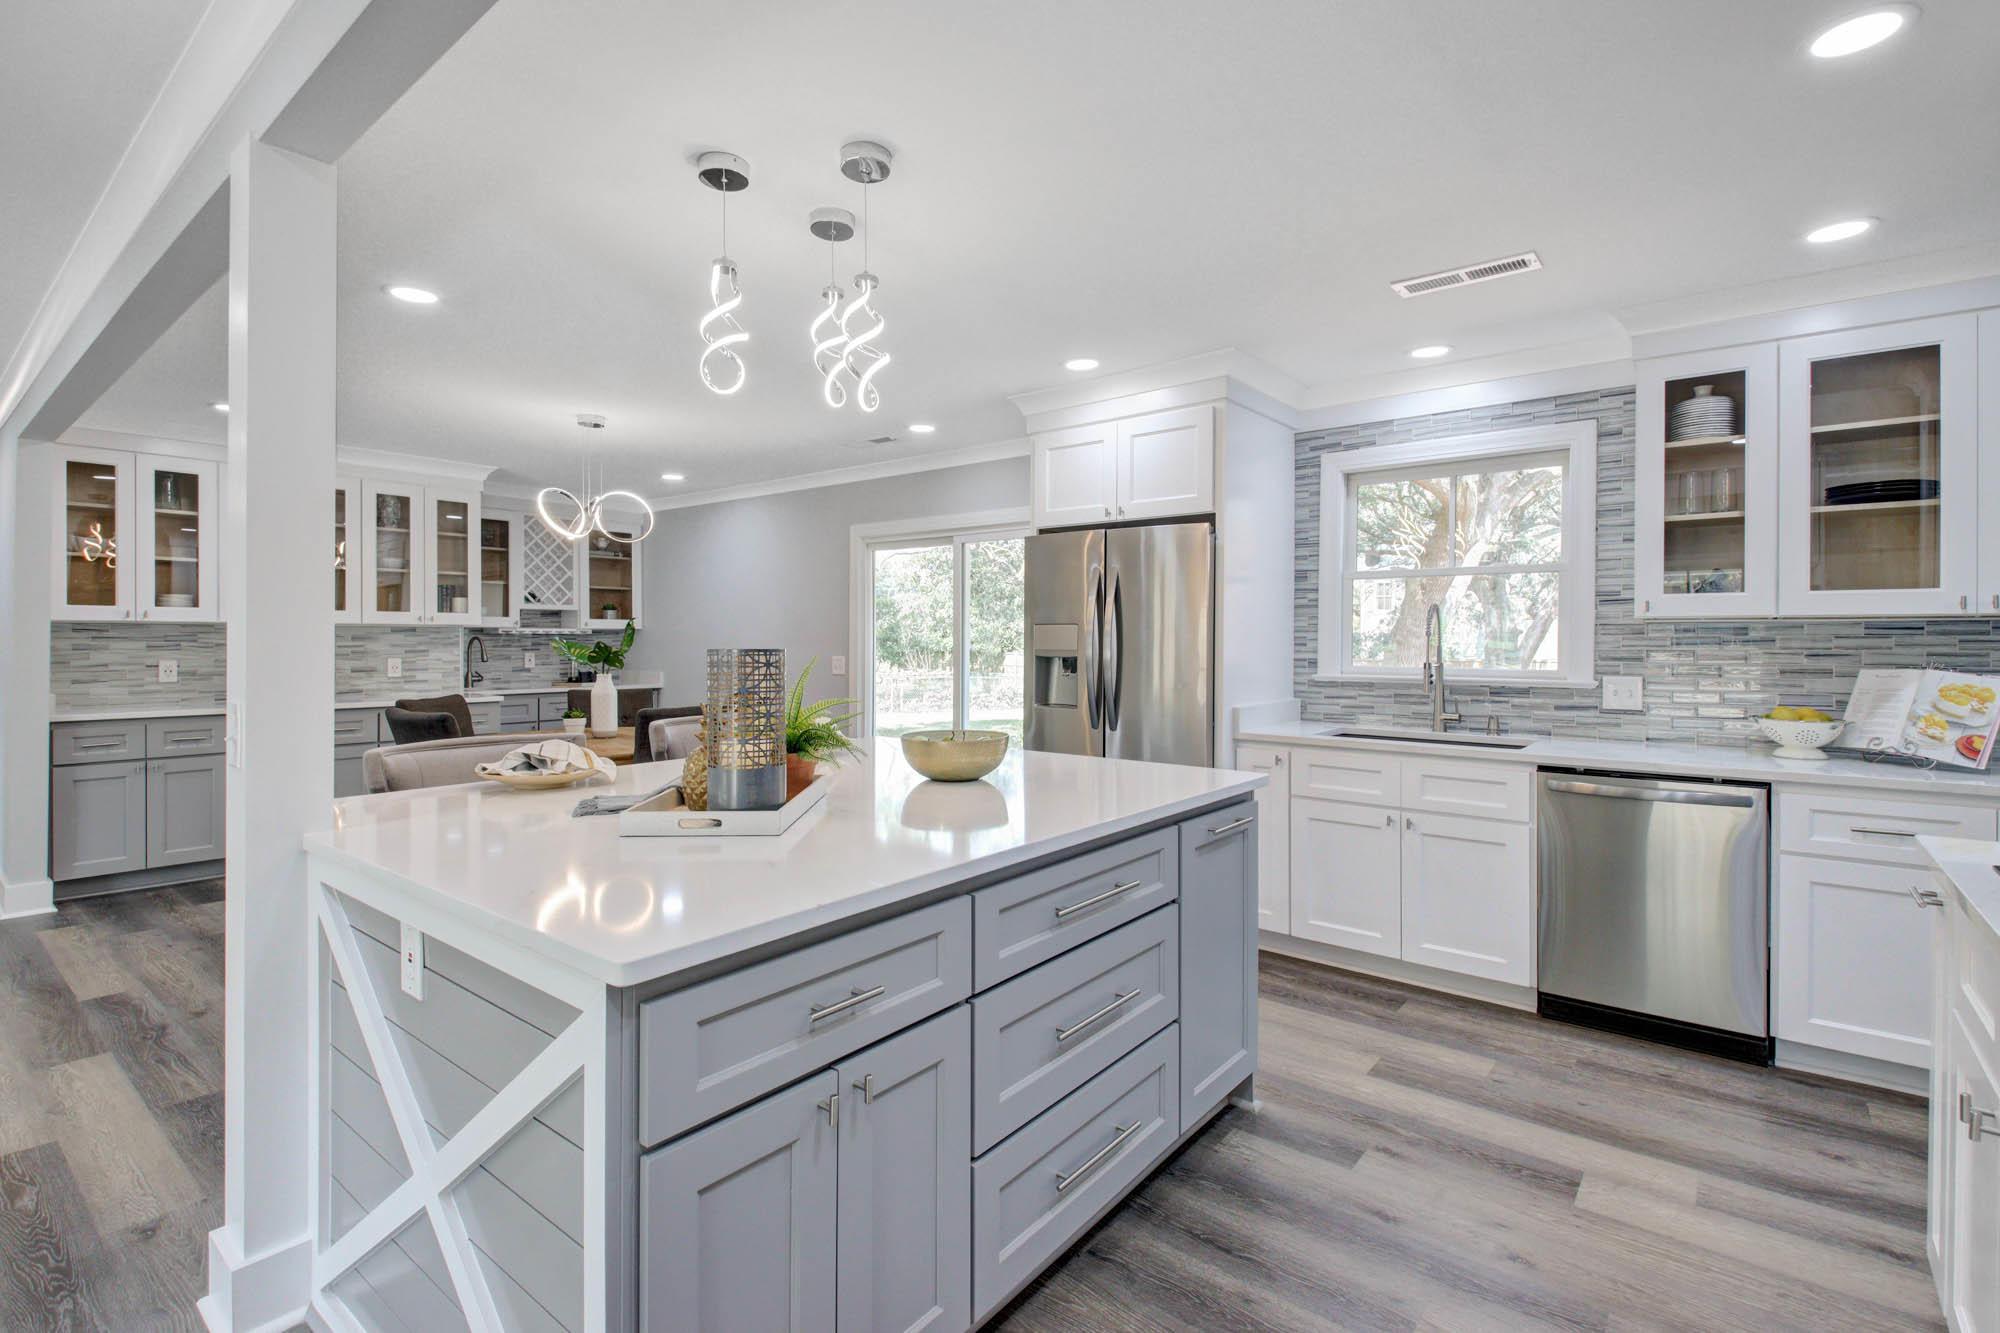 Scanlonville Homes For Sale - 344 4th, Mount Pleasant, SC - 11